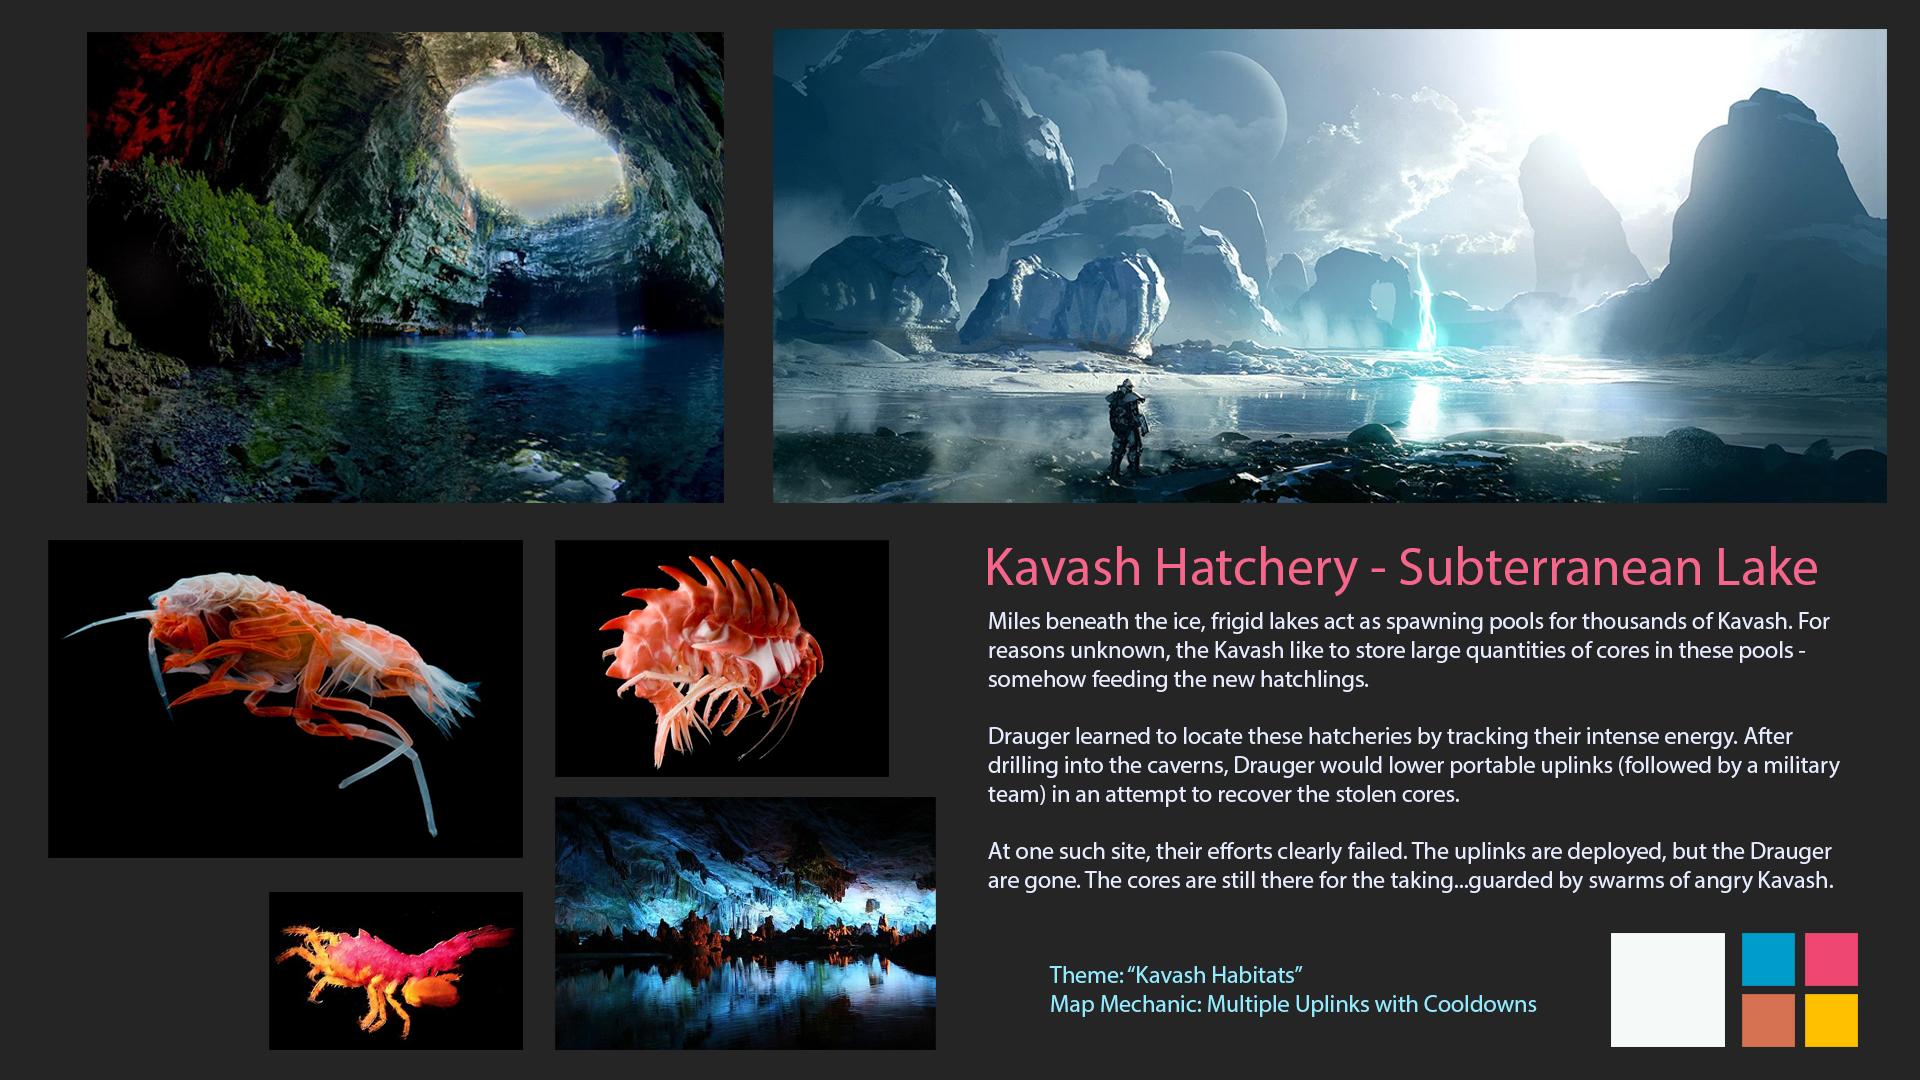 reference_collage_-kavash_hatchery_-_subterranean_lake.jpg